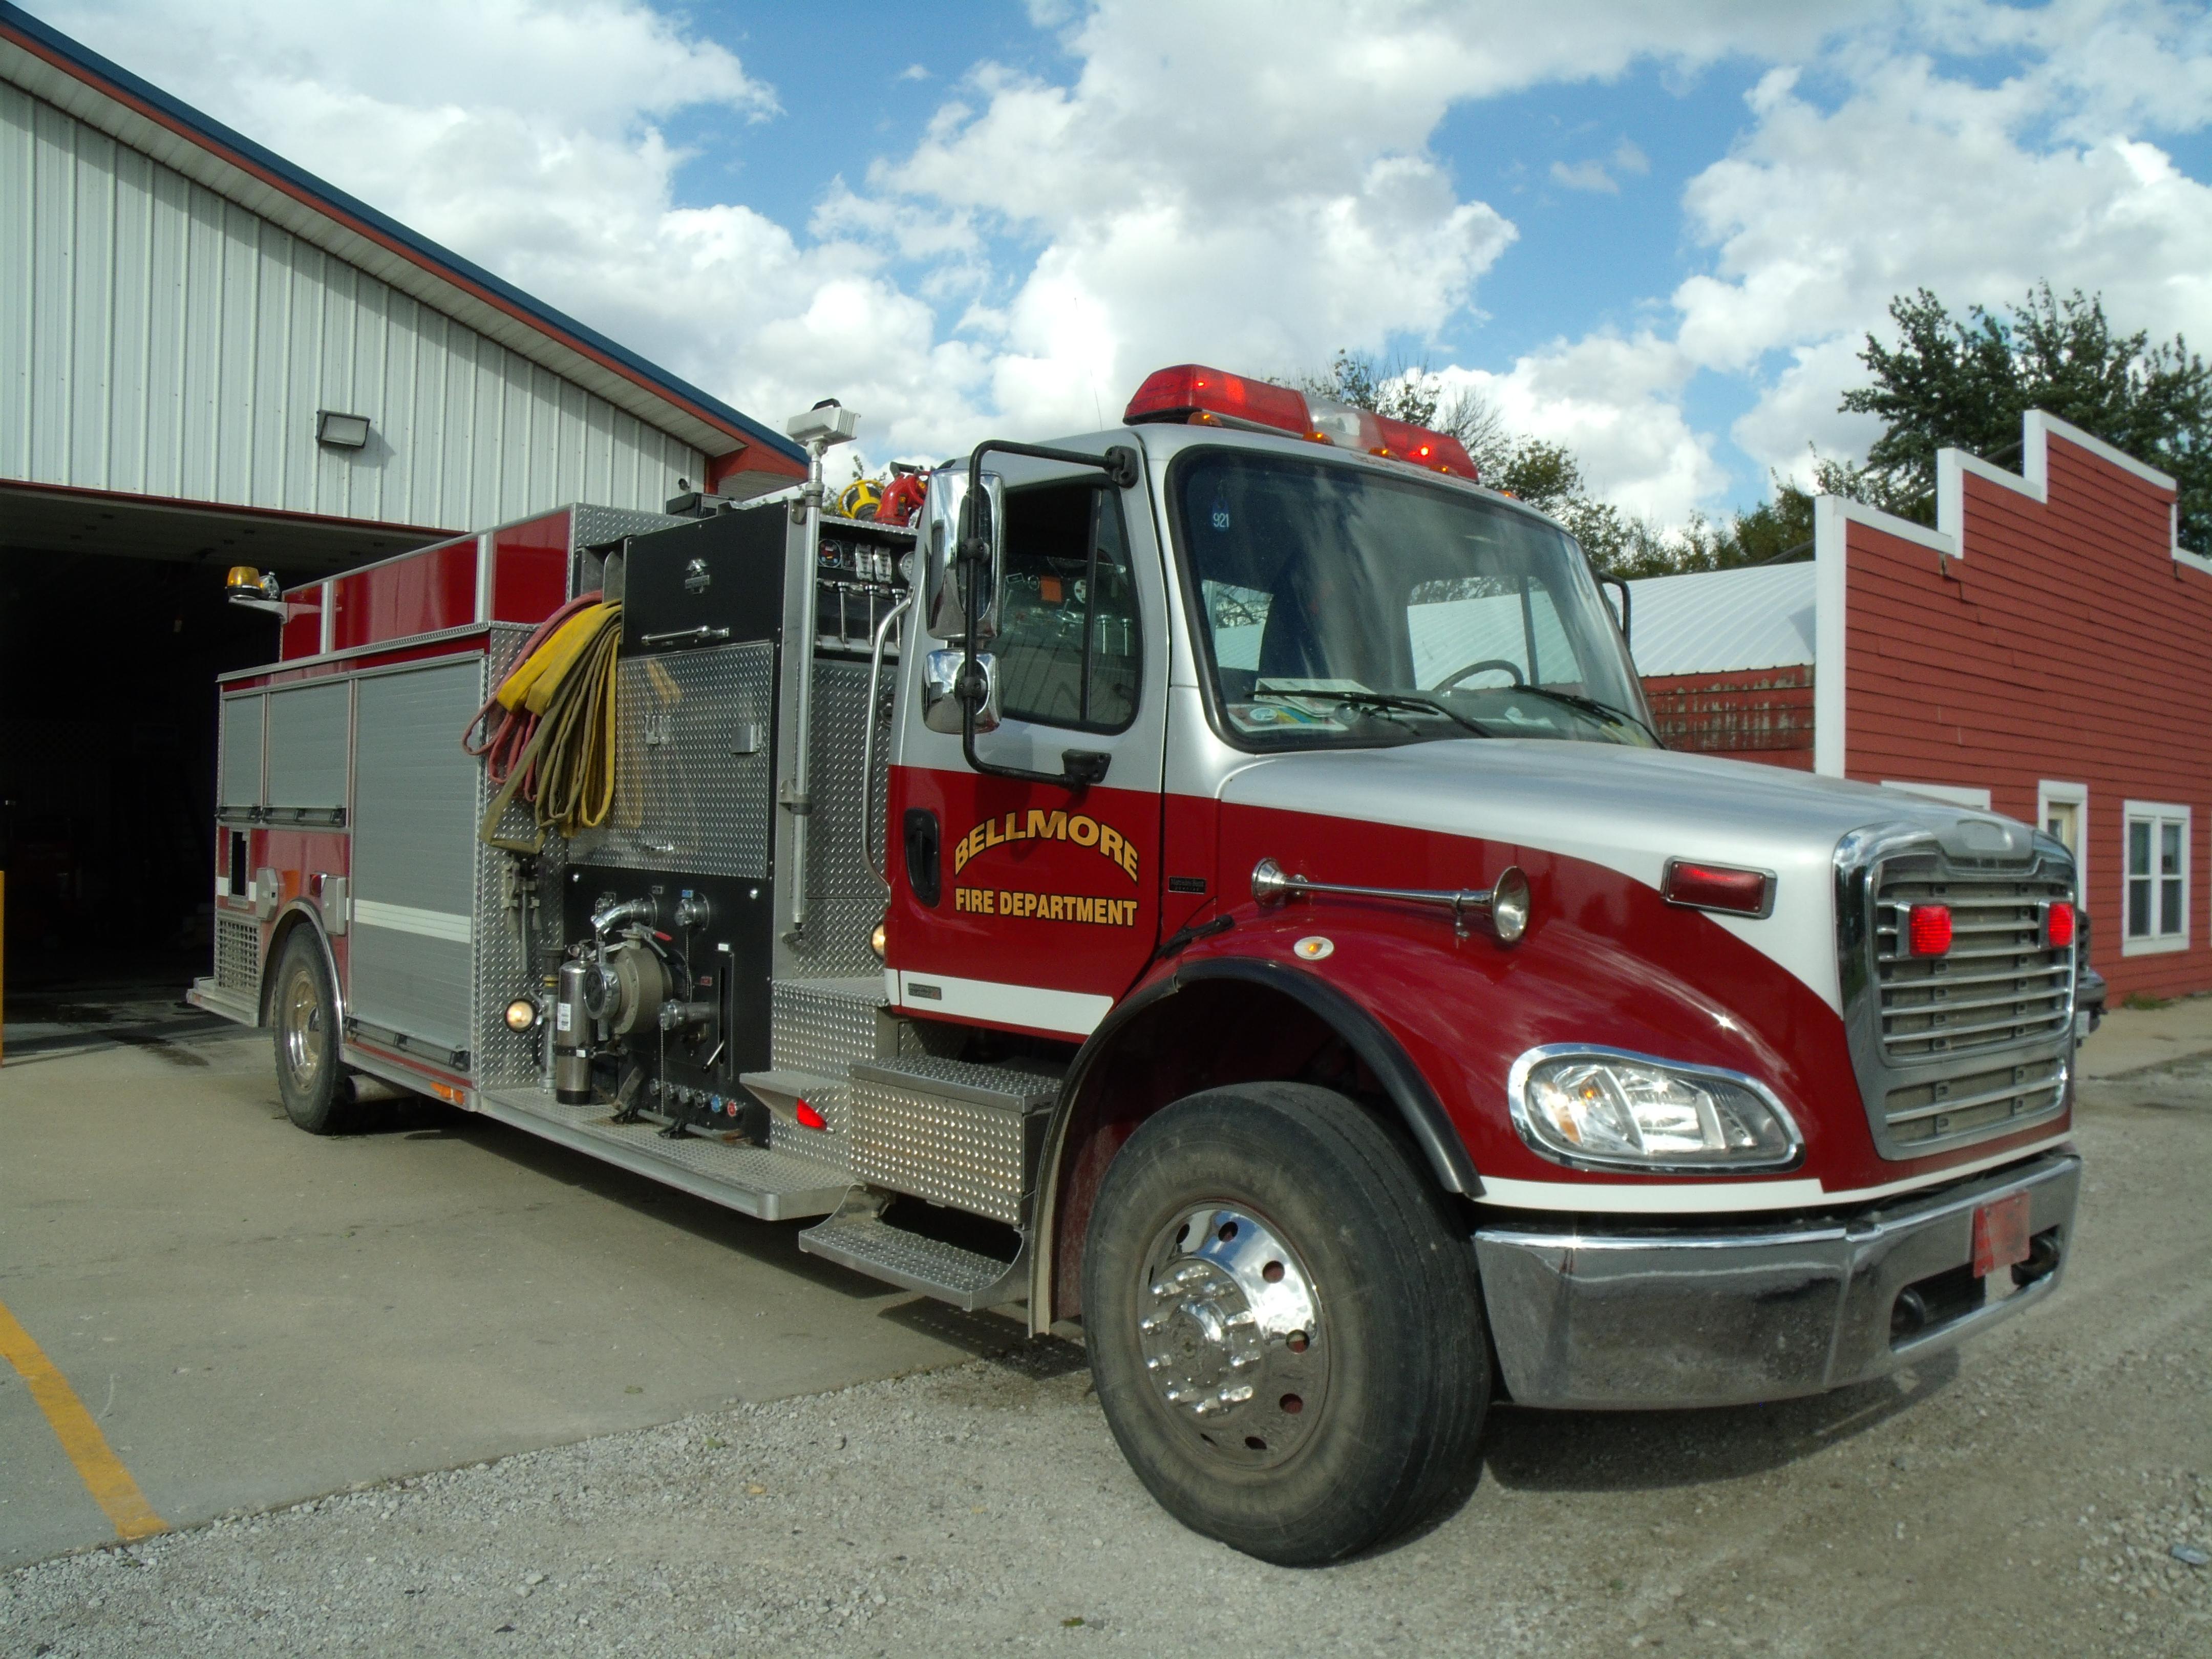 Engine 91